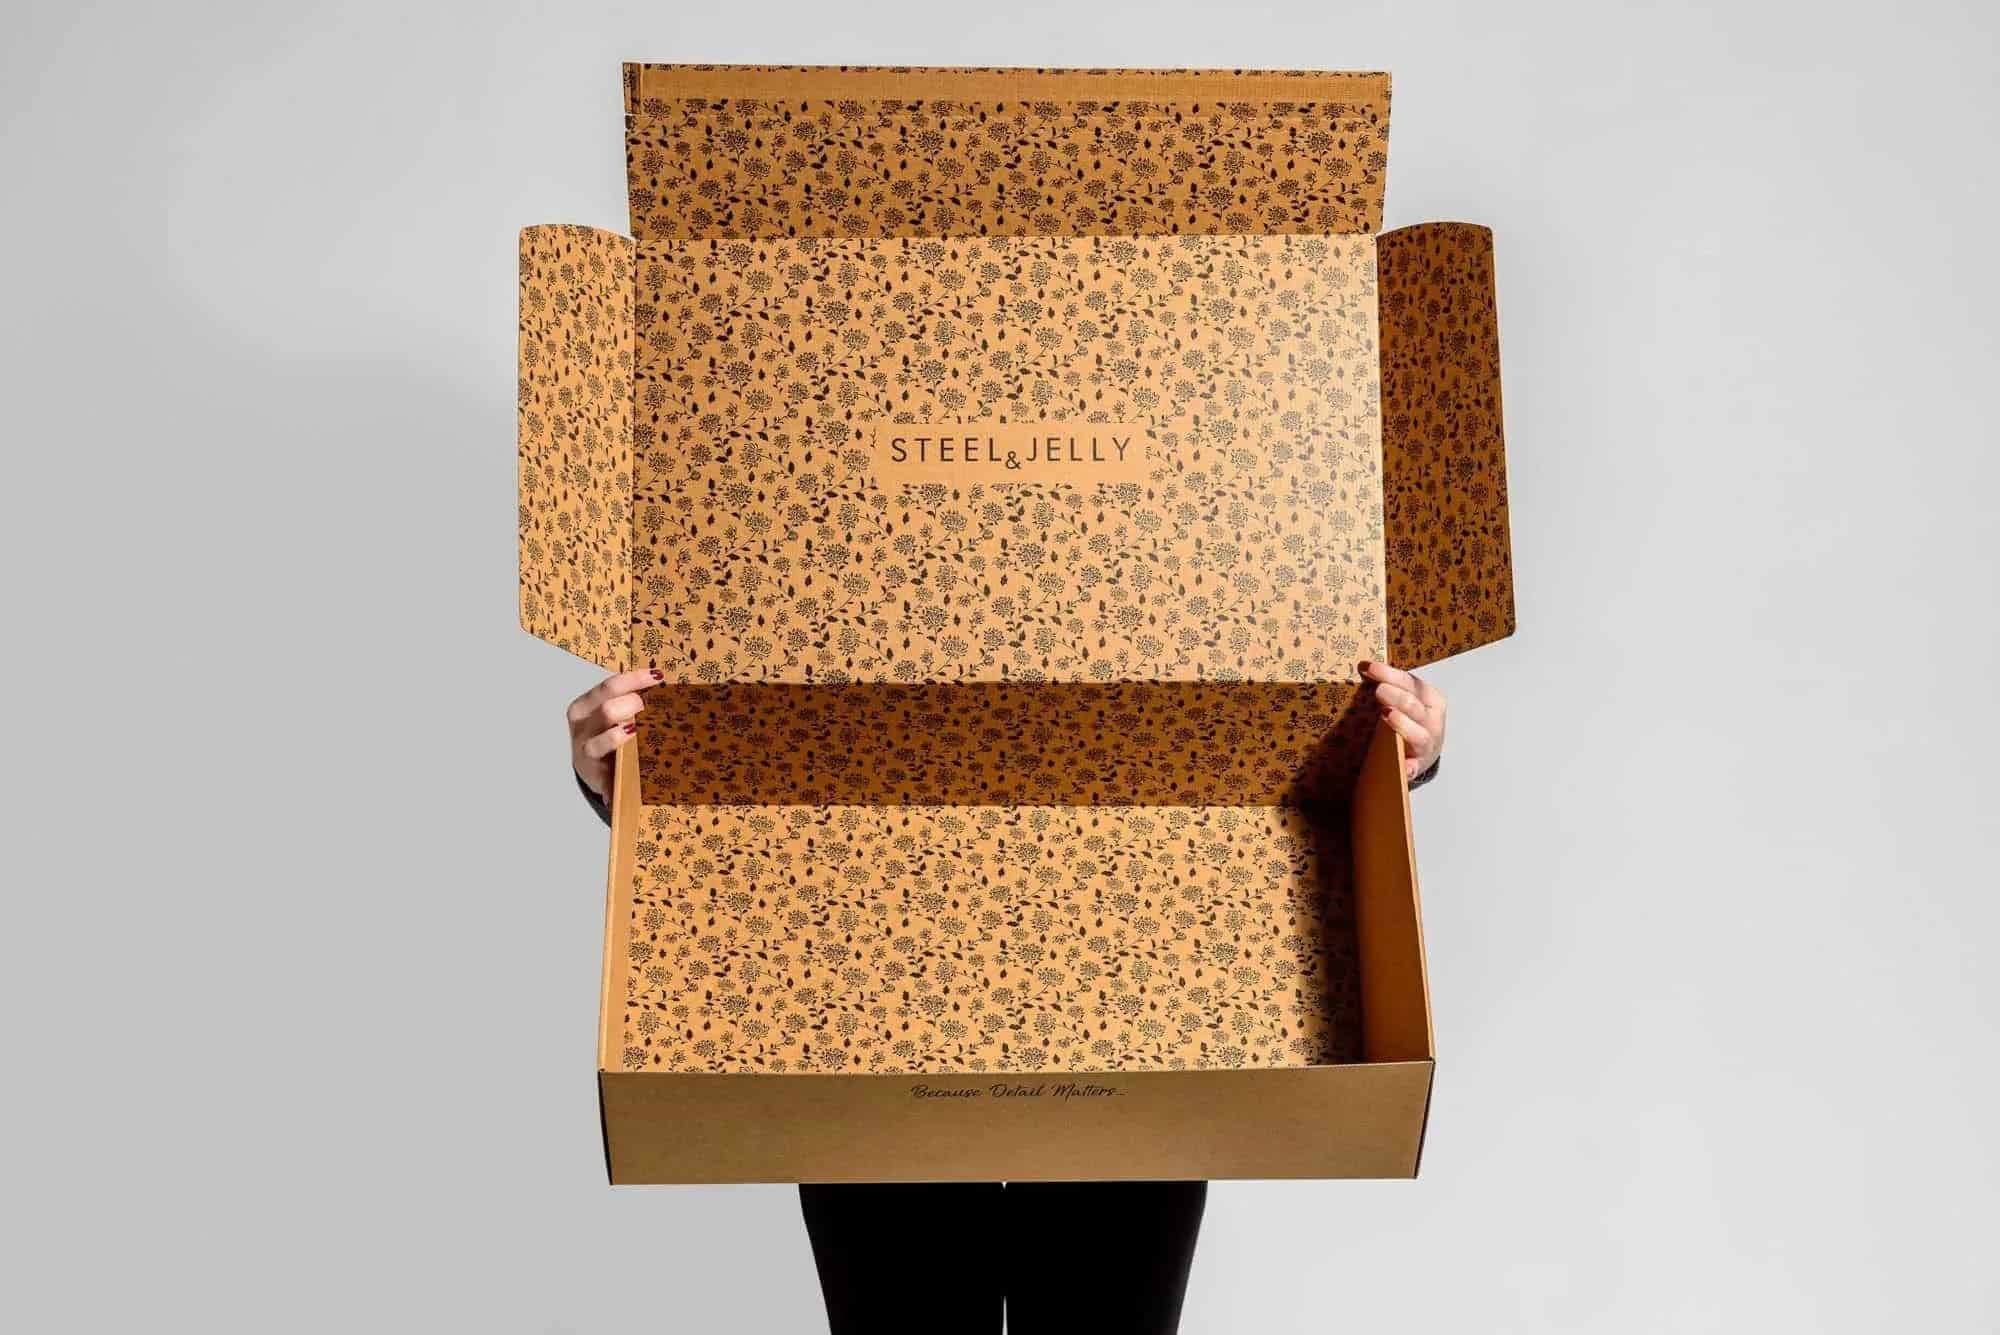 Steel & Jelly Shipper's branded e-commerce box